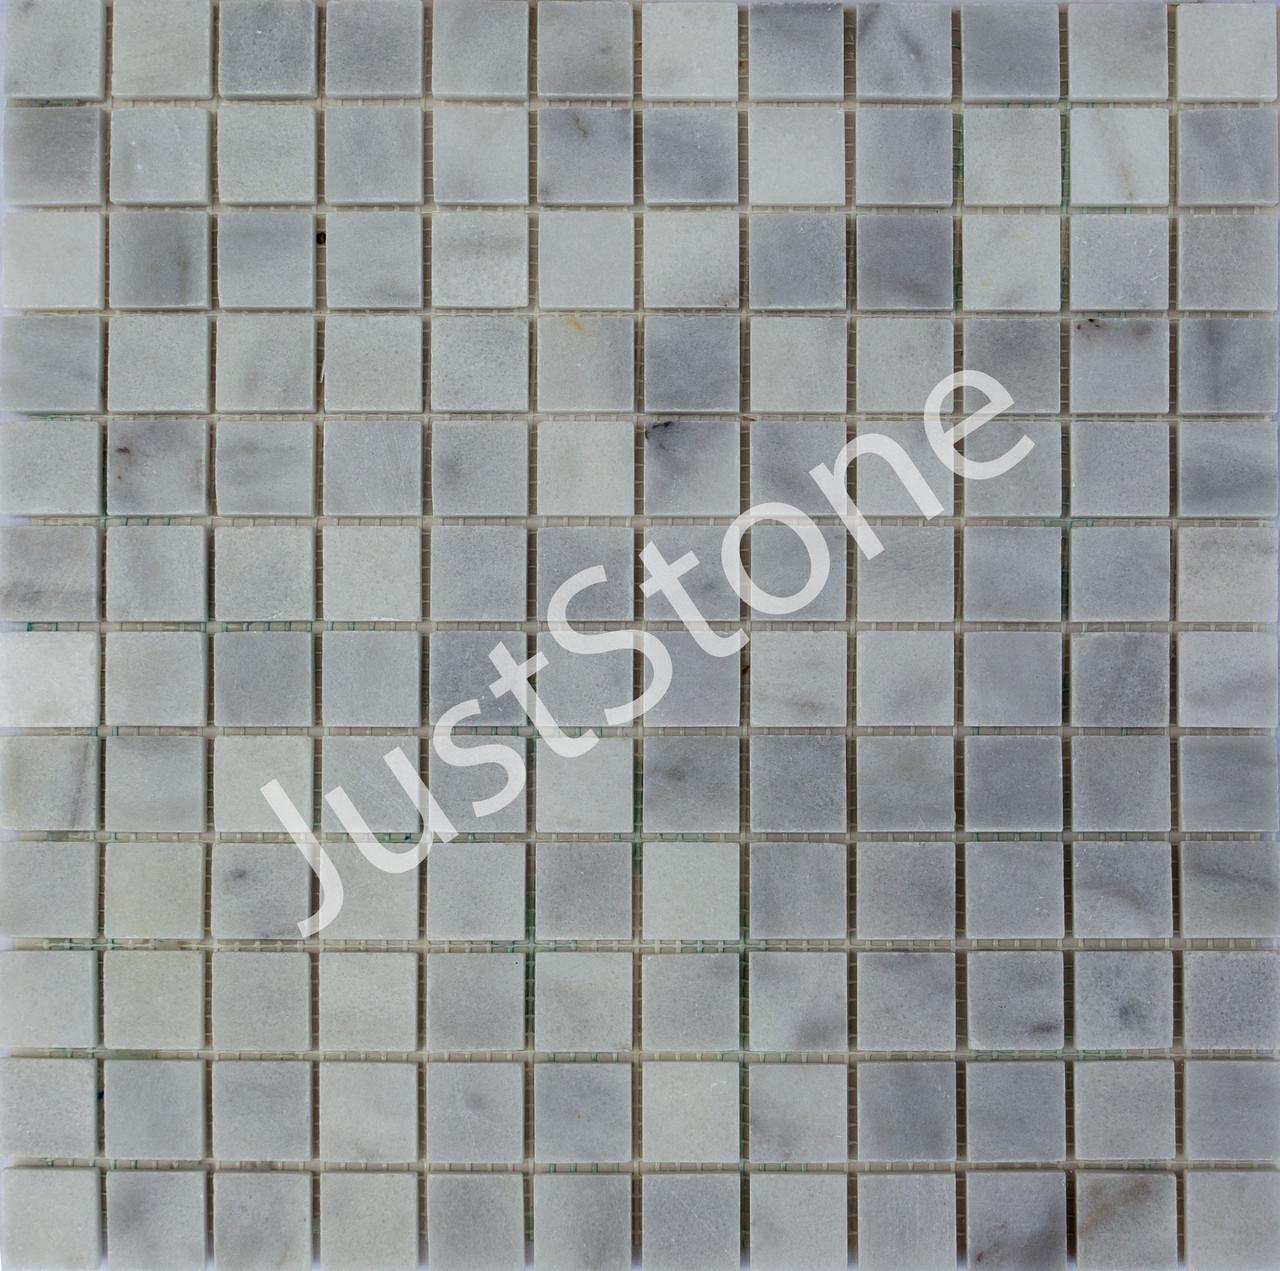 Мраморная Мозаика Полированная МКР-2П (23x23) 6 мм White Mix